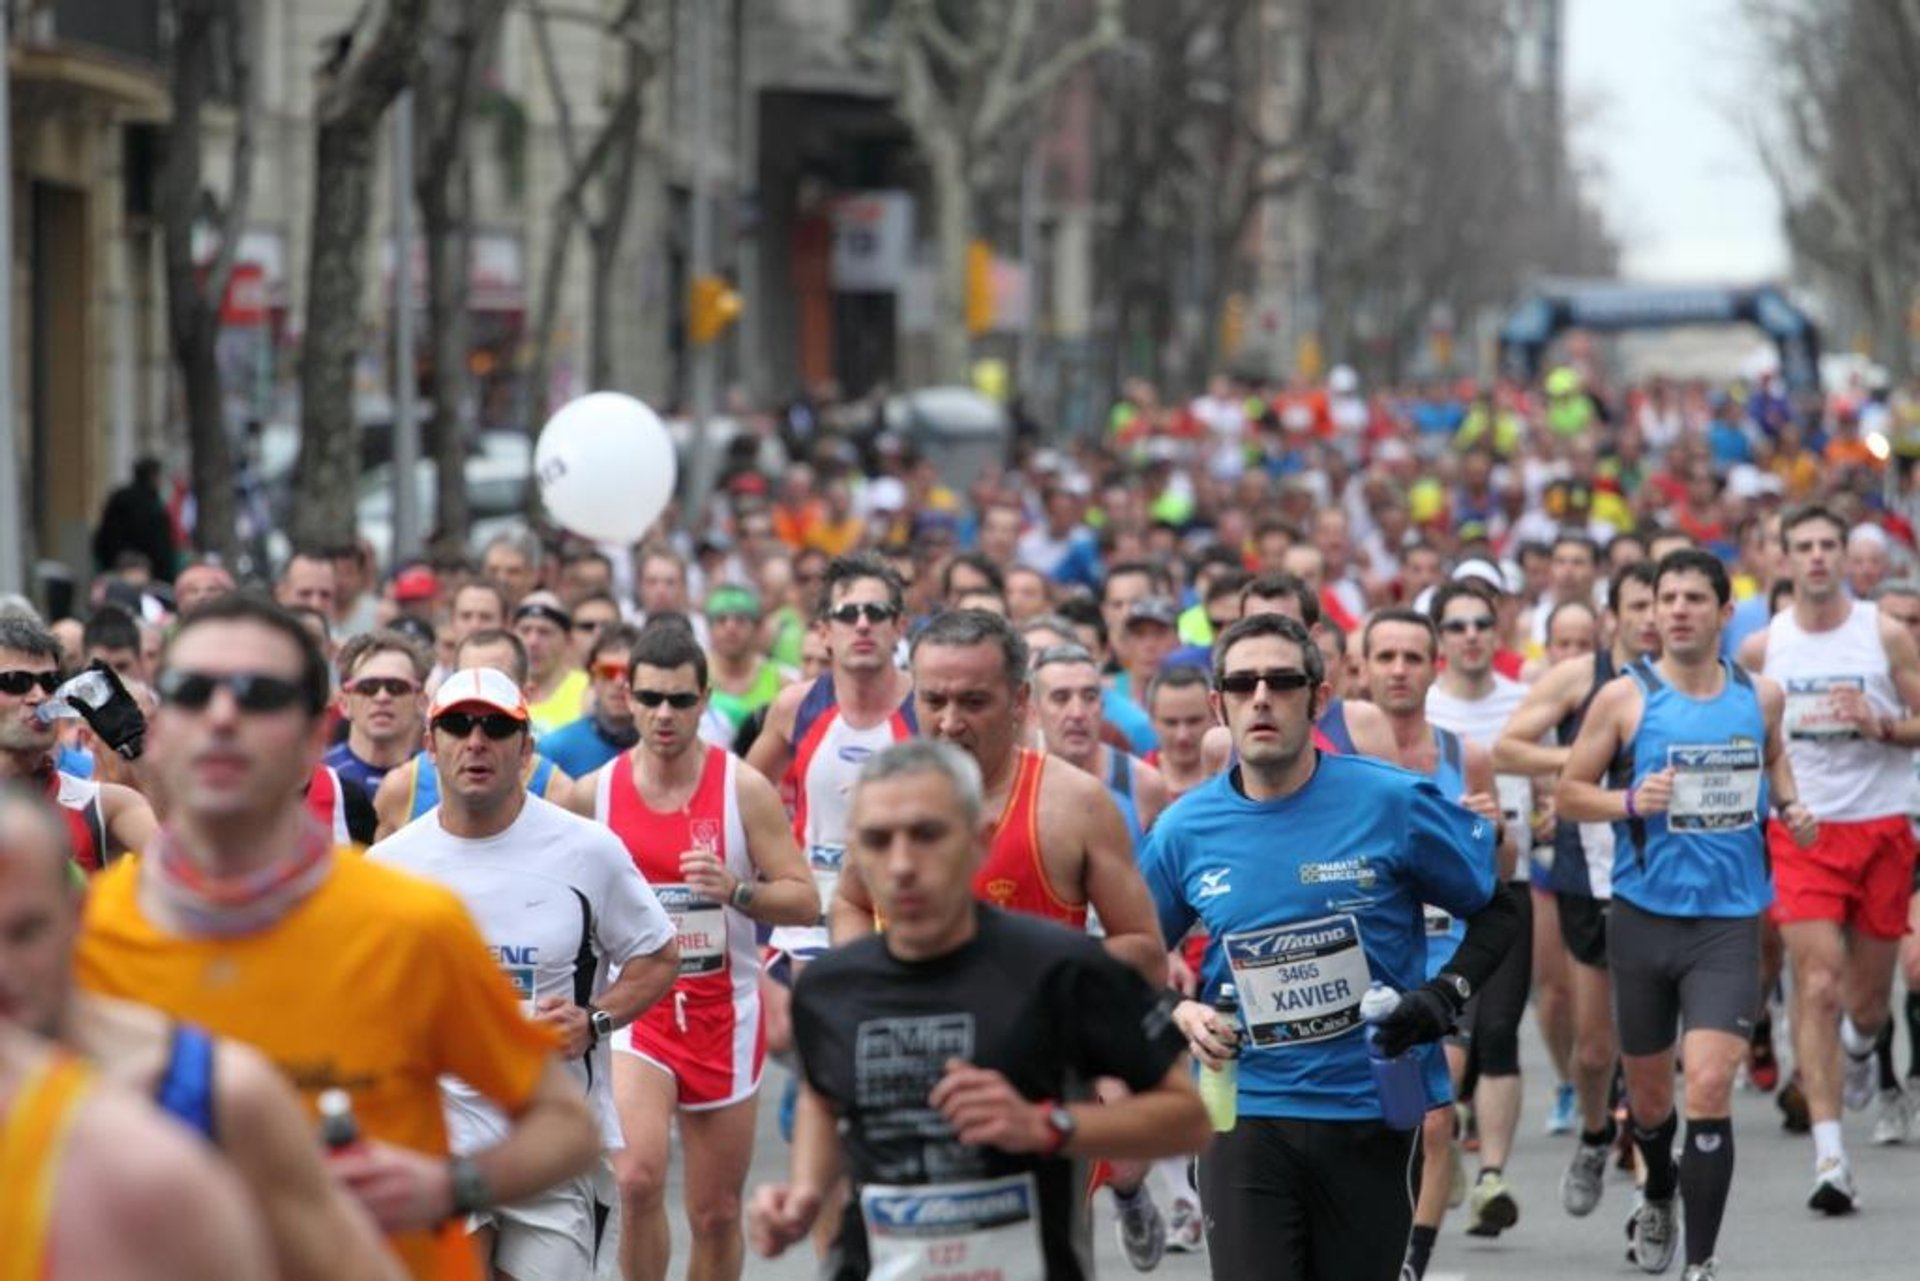 Barcelona Marathon in Barcelona - Best Time